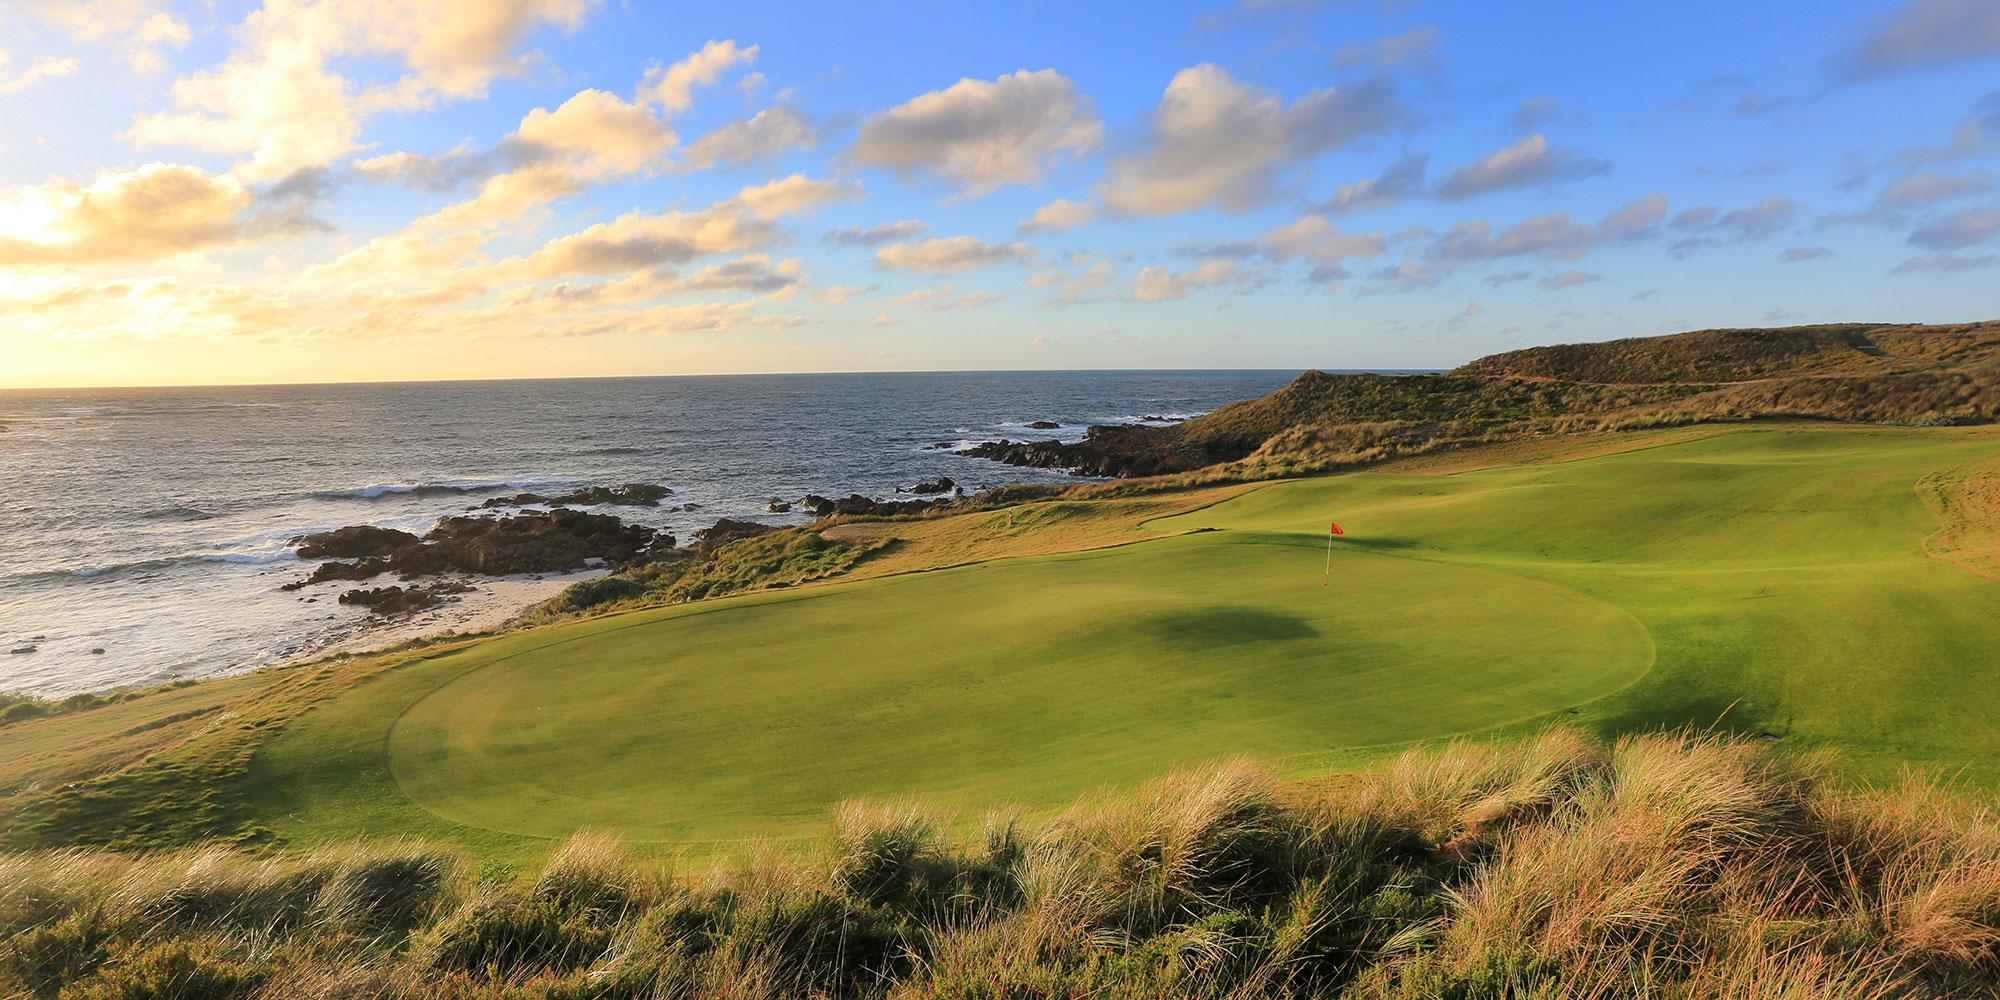 King Island, TAS | 2 nights, 3 rounds of golf